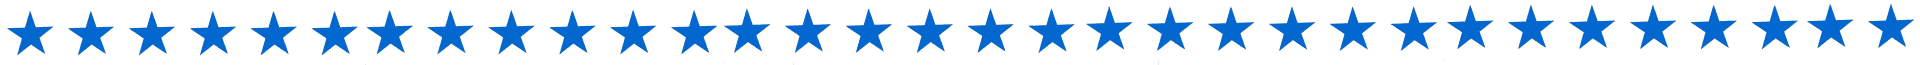 Blue Star Brewery Divider Line